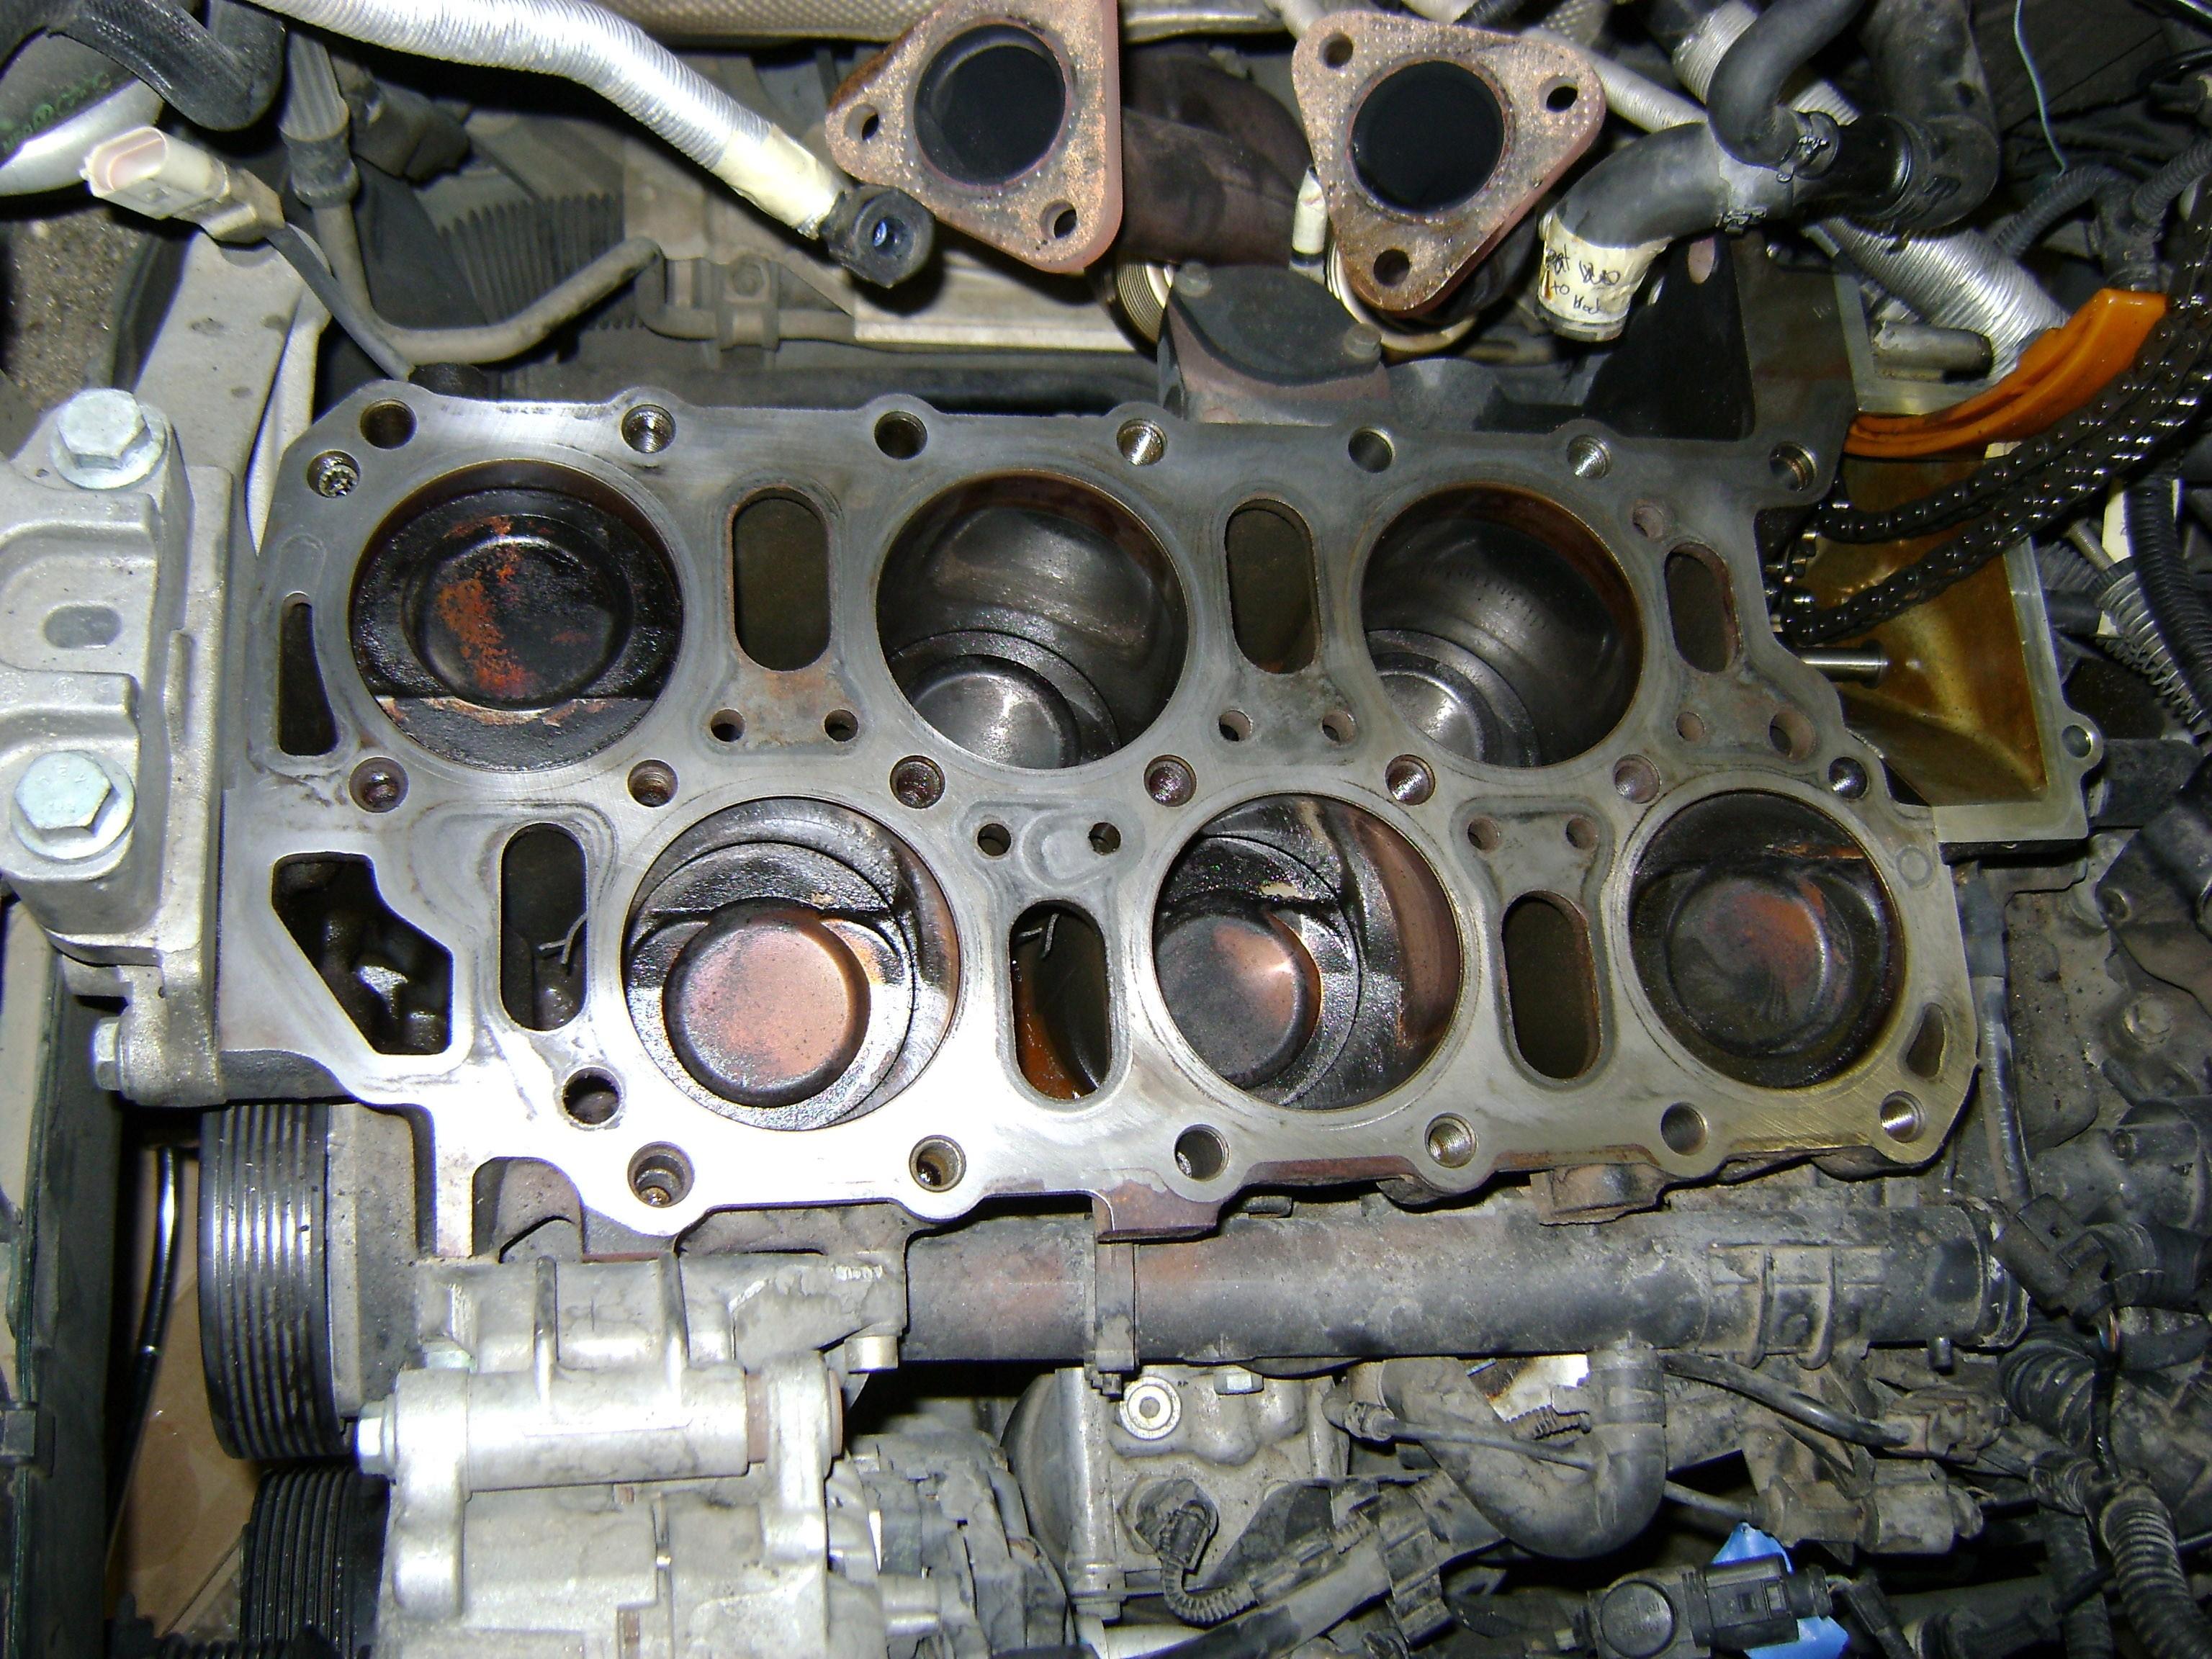 2000 Vw Jetta Vr6 Wiring Diagram